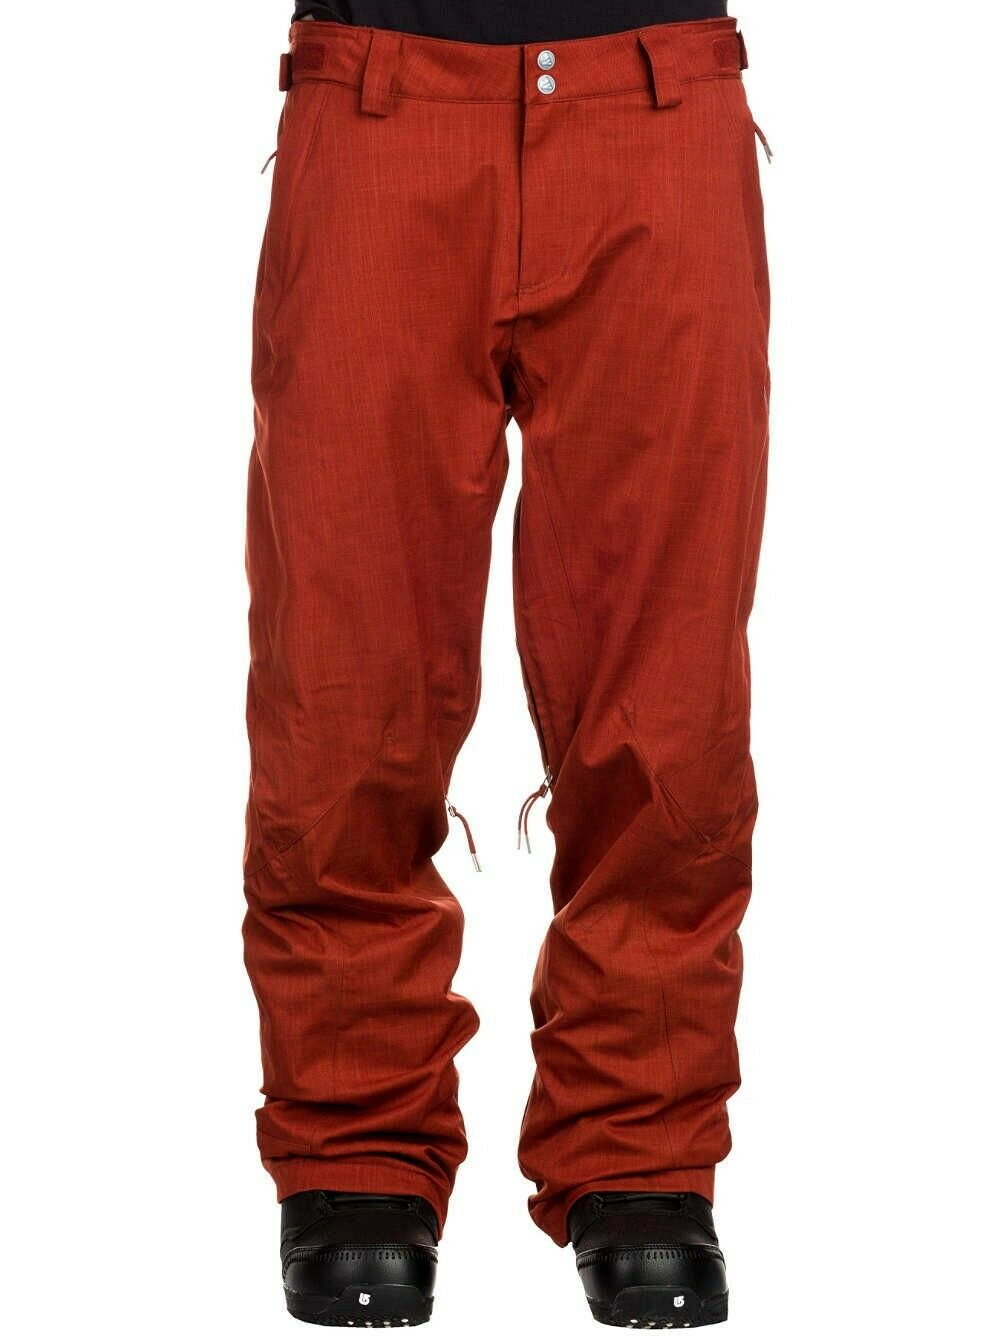 Zimtstern Typer Mash Snowpants Ski Snowboard Pants Men's Chestnut (Rust) New